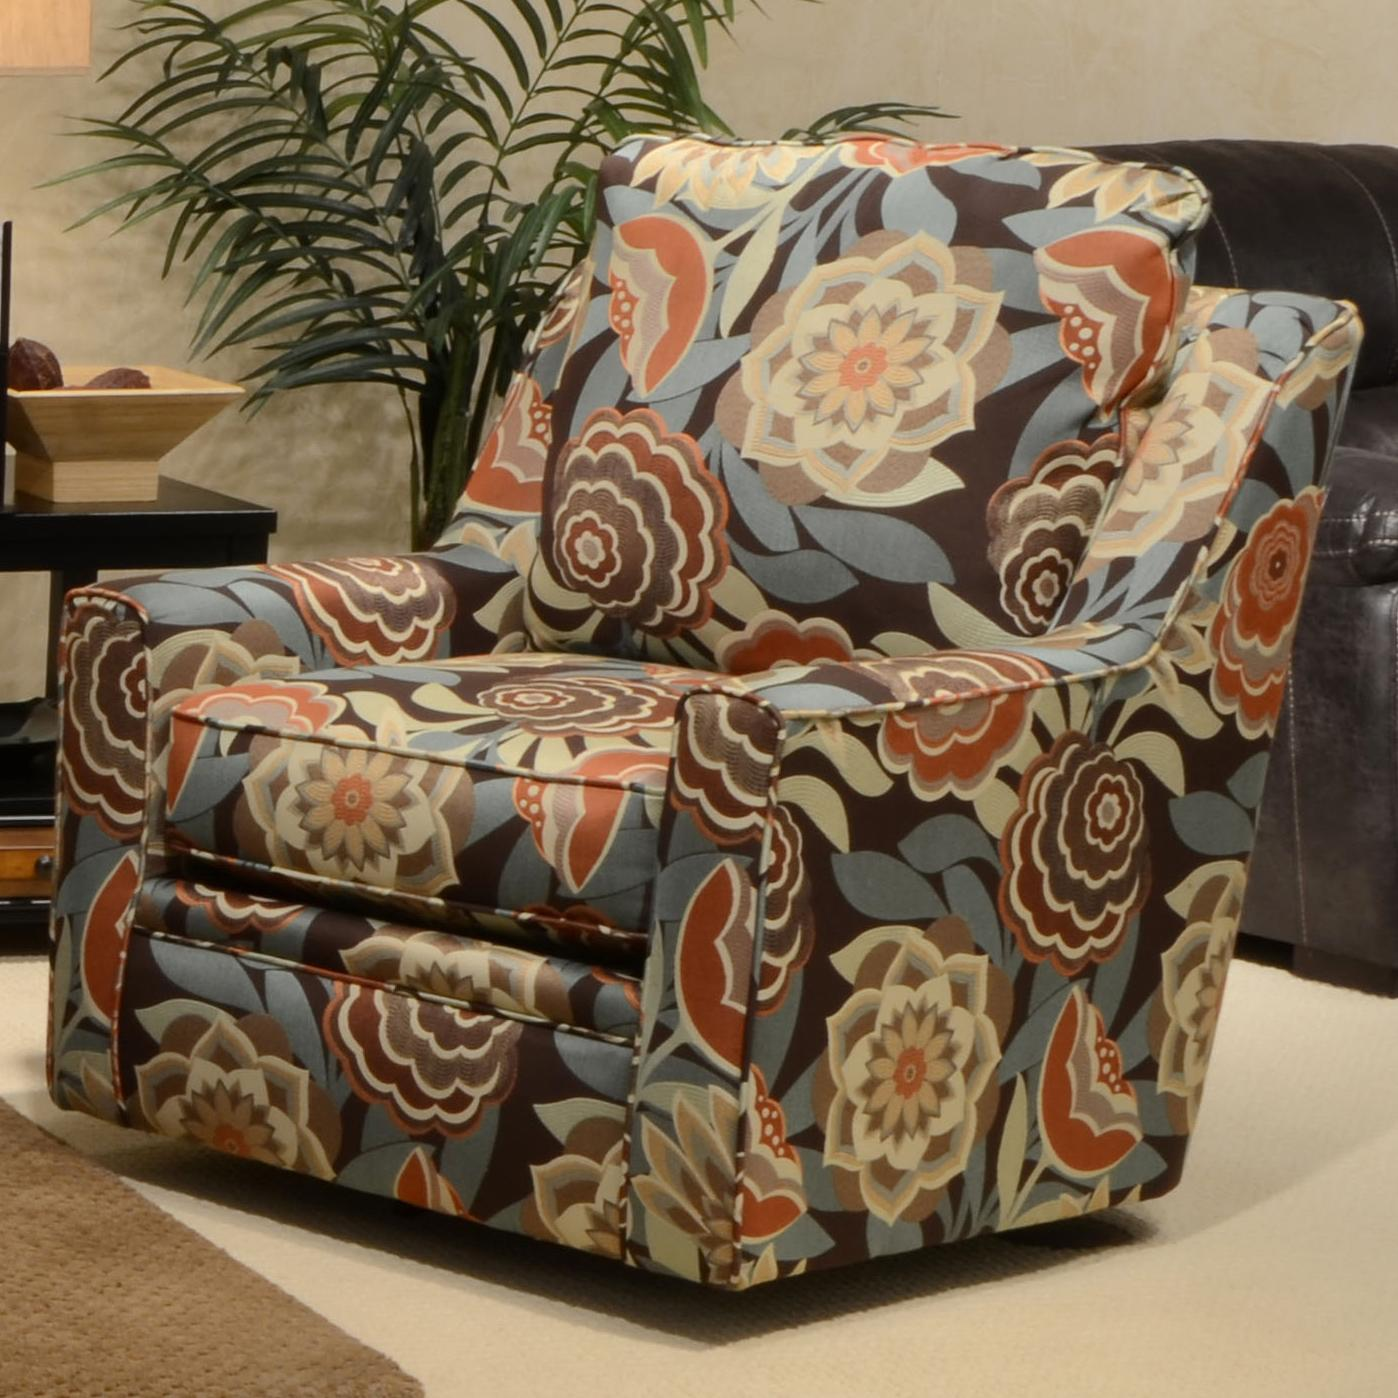 Jackson Furniture Sutton  Swivel Chair - Item Number: 722-21-MultiColor Floral